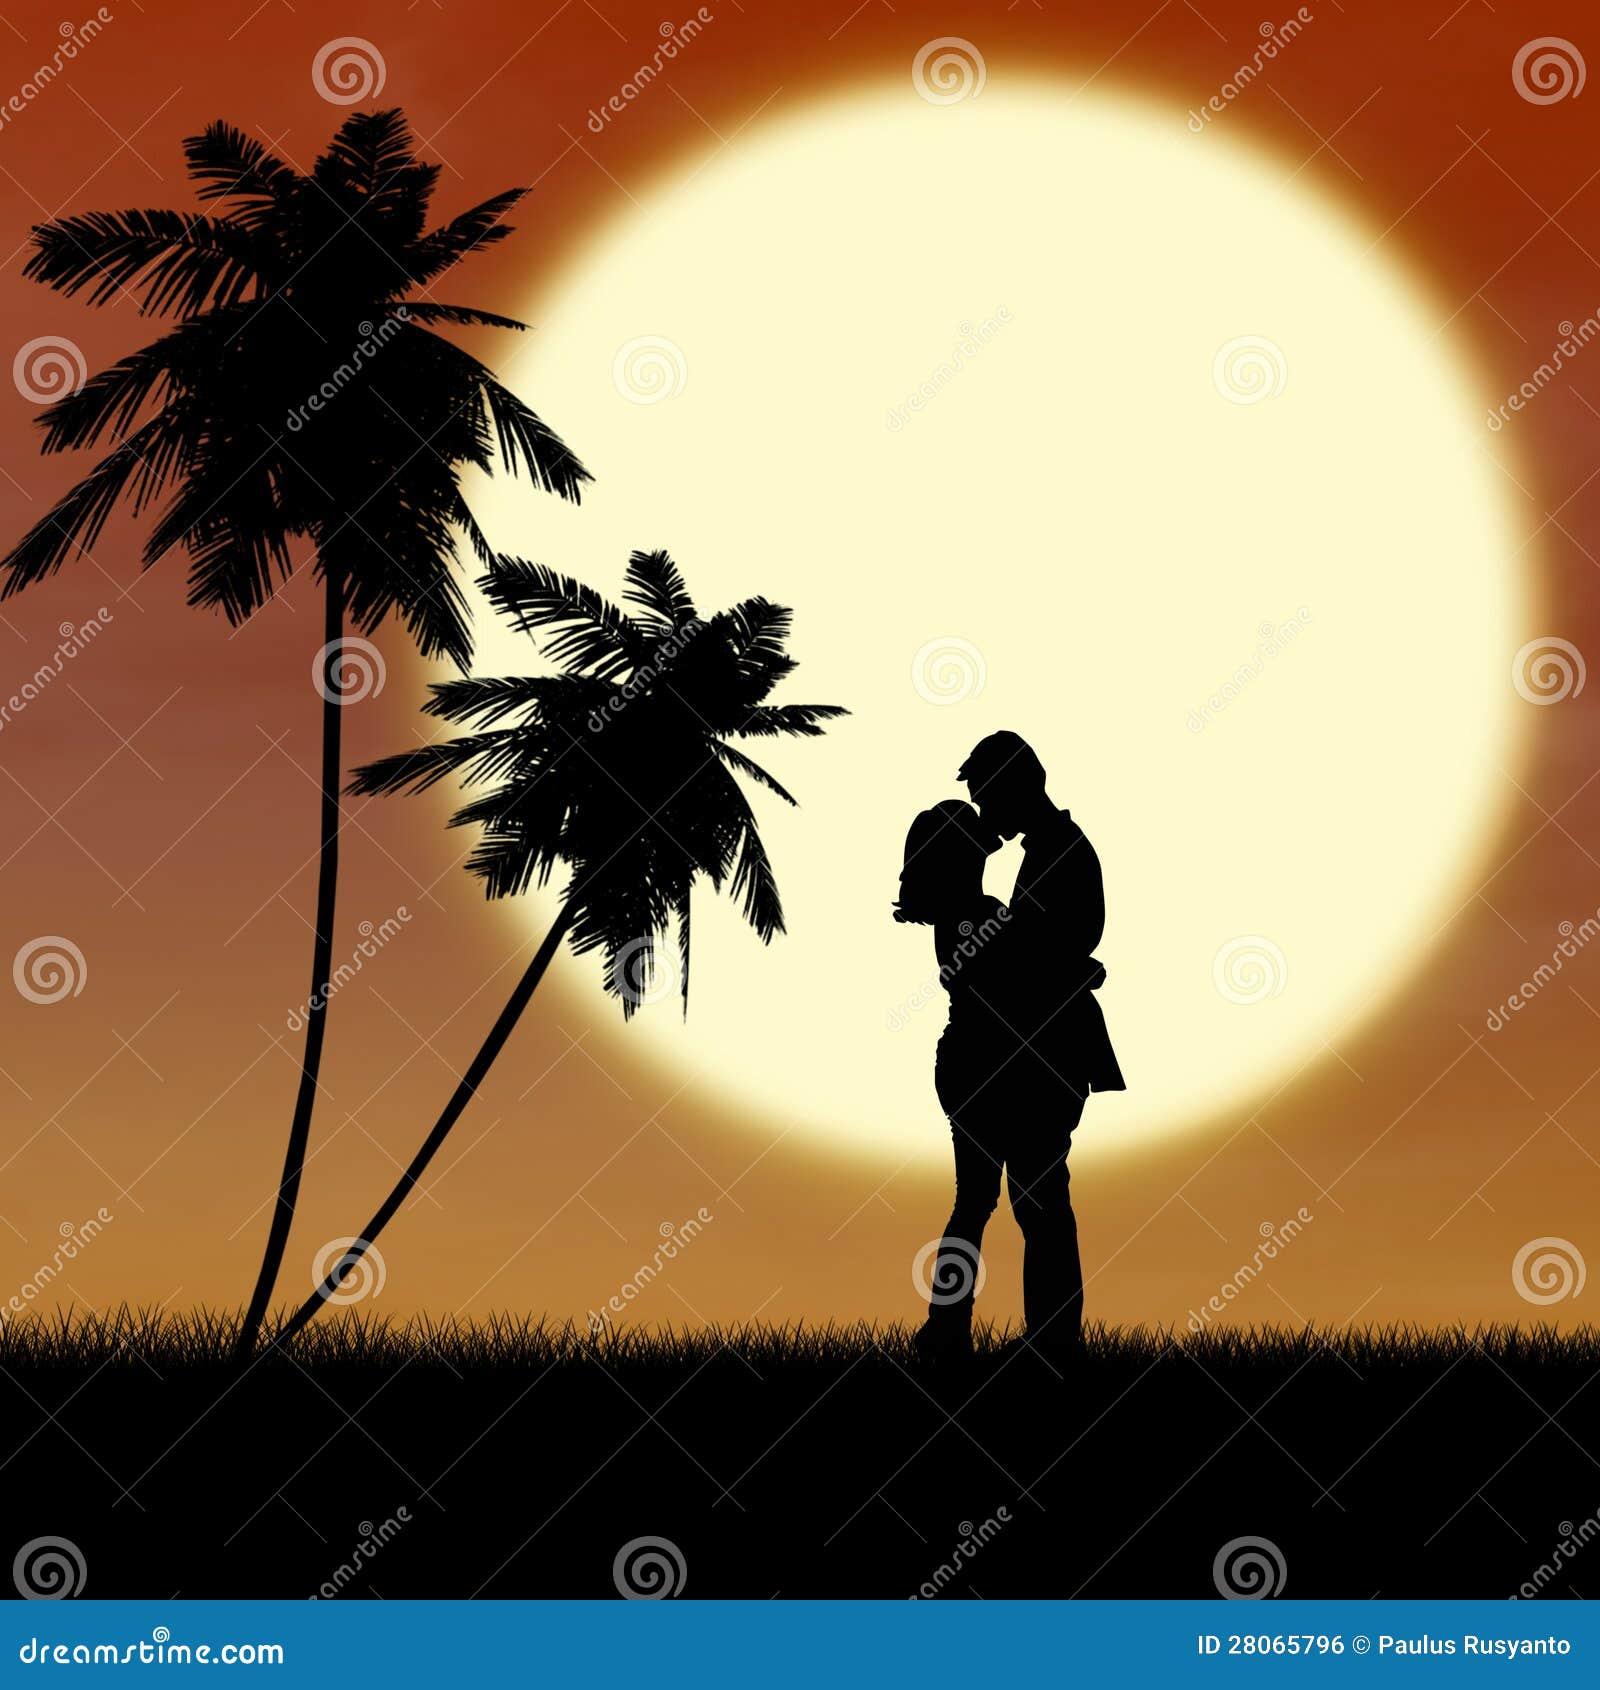 clipart honeymoon - photo #23